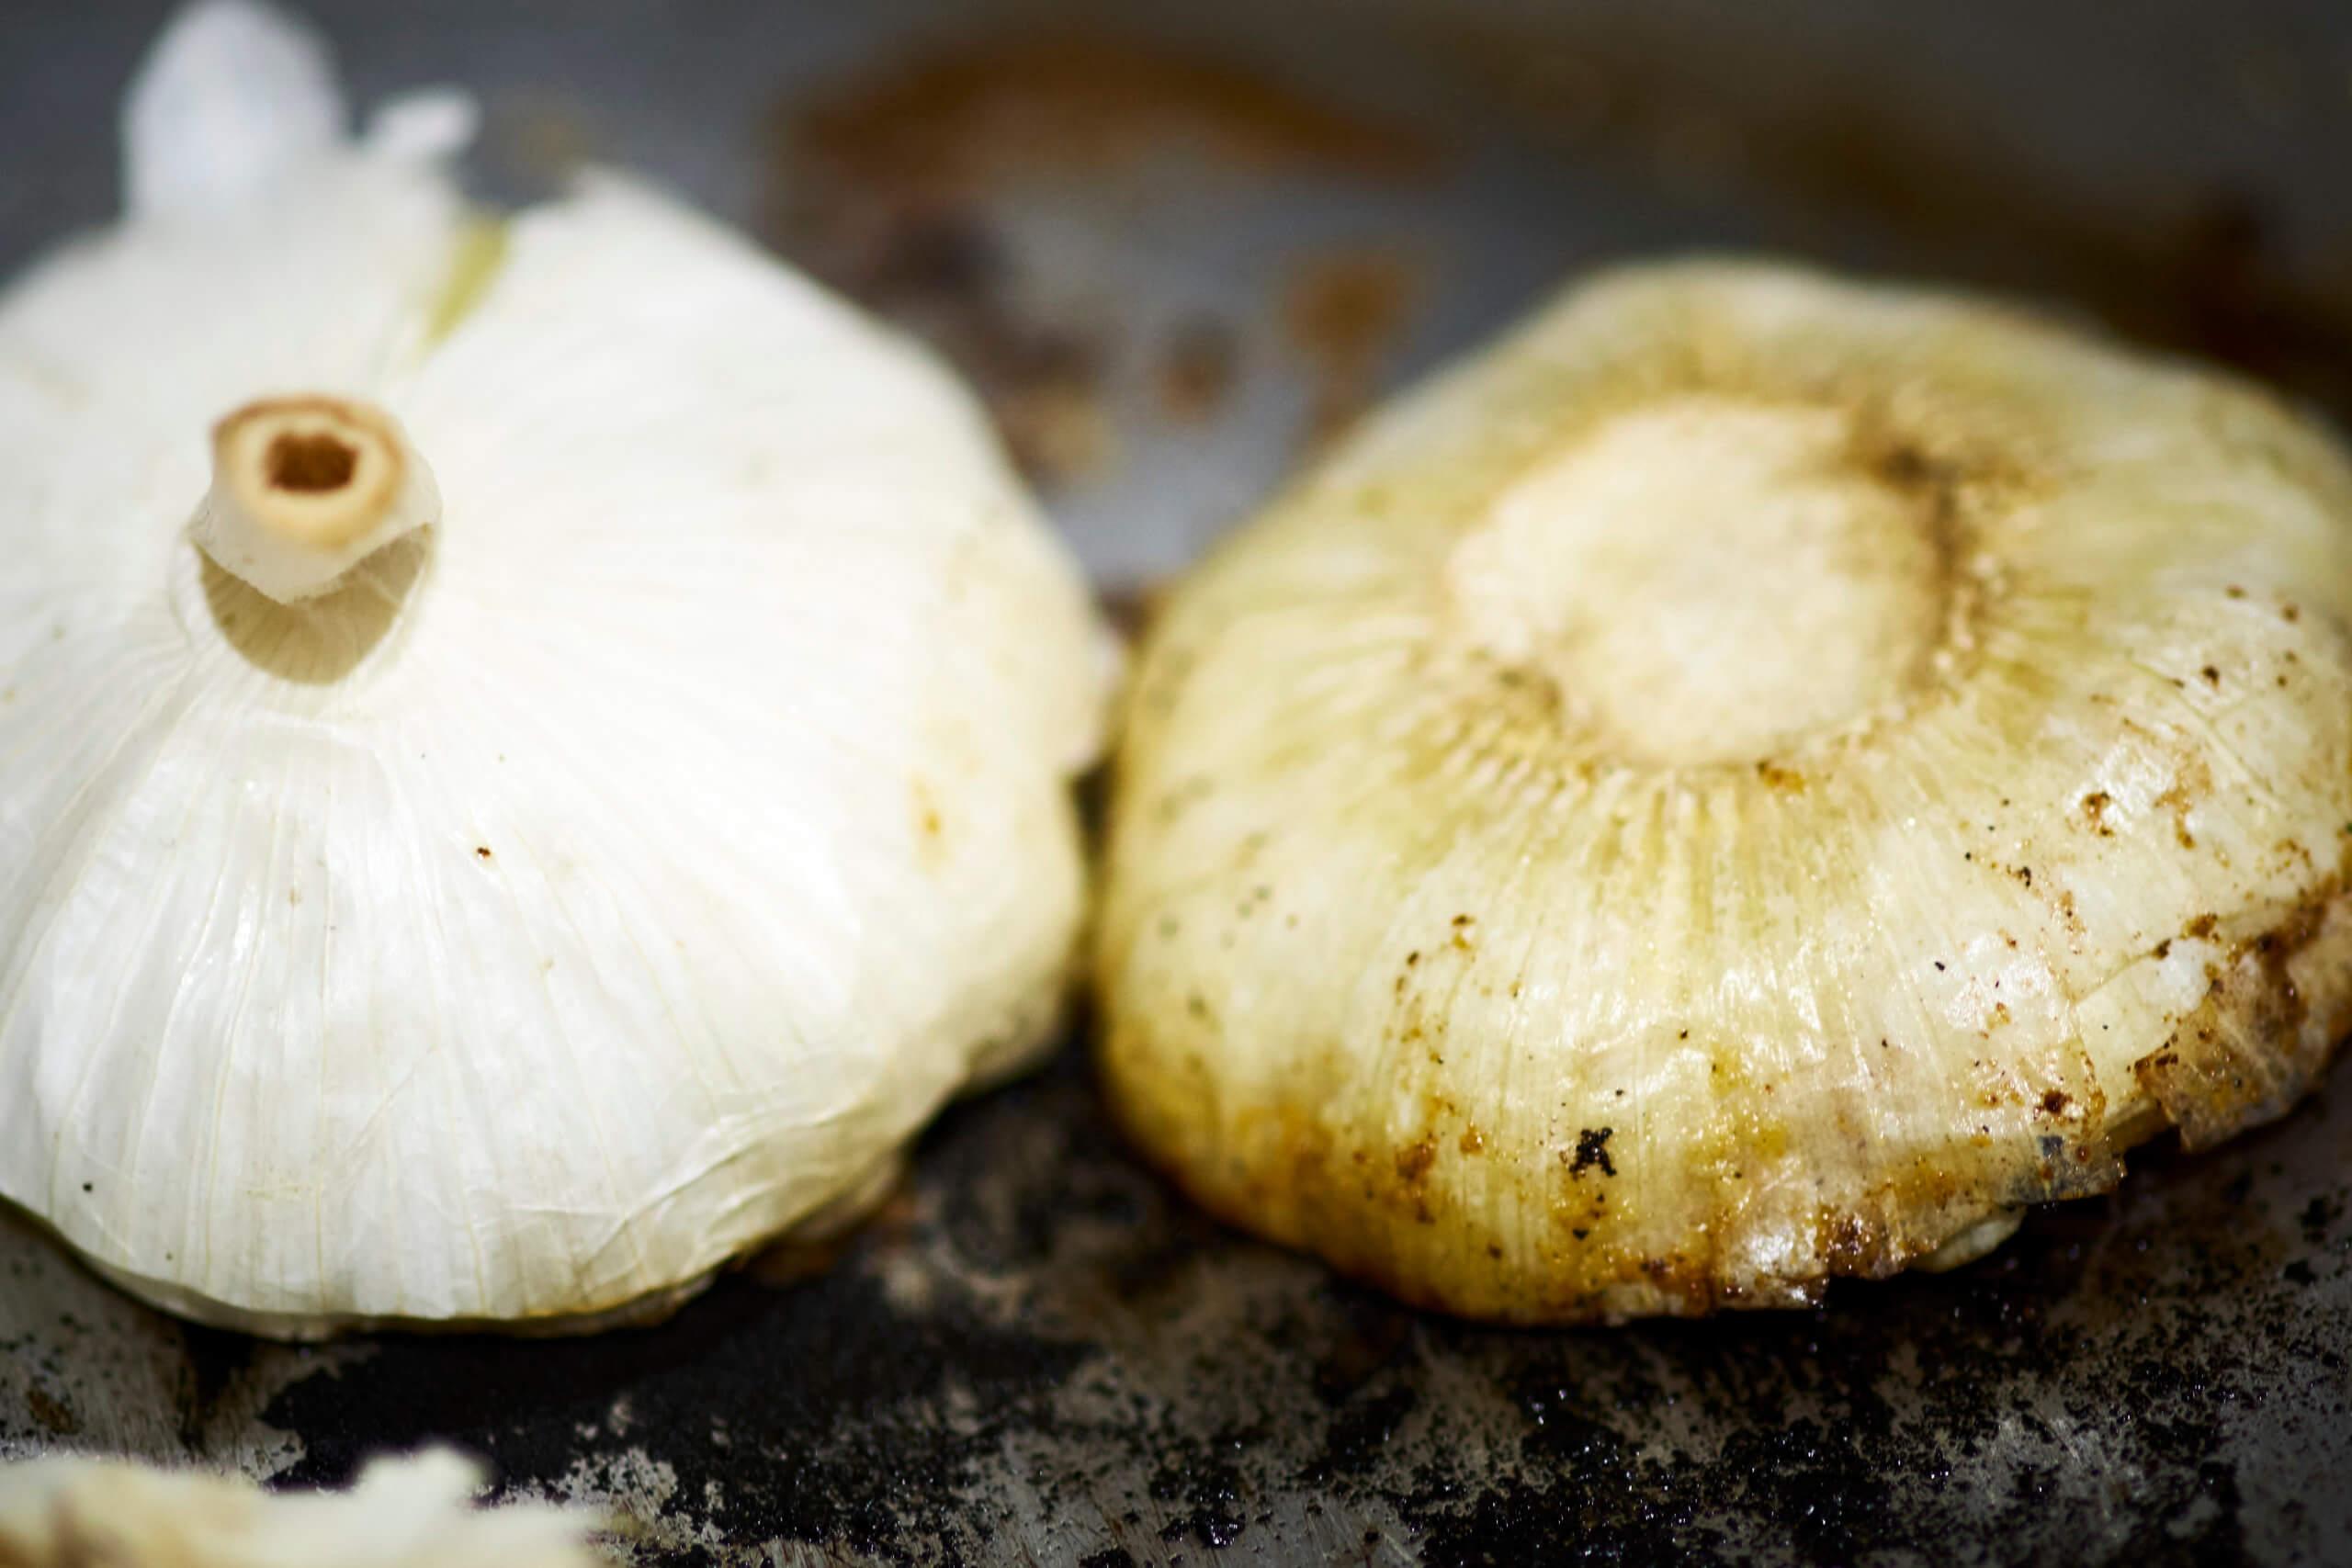 Mullixhiu Produce Garlic